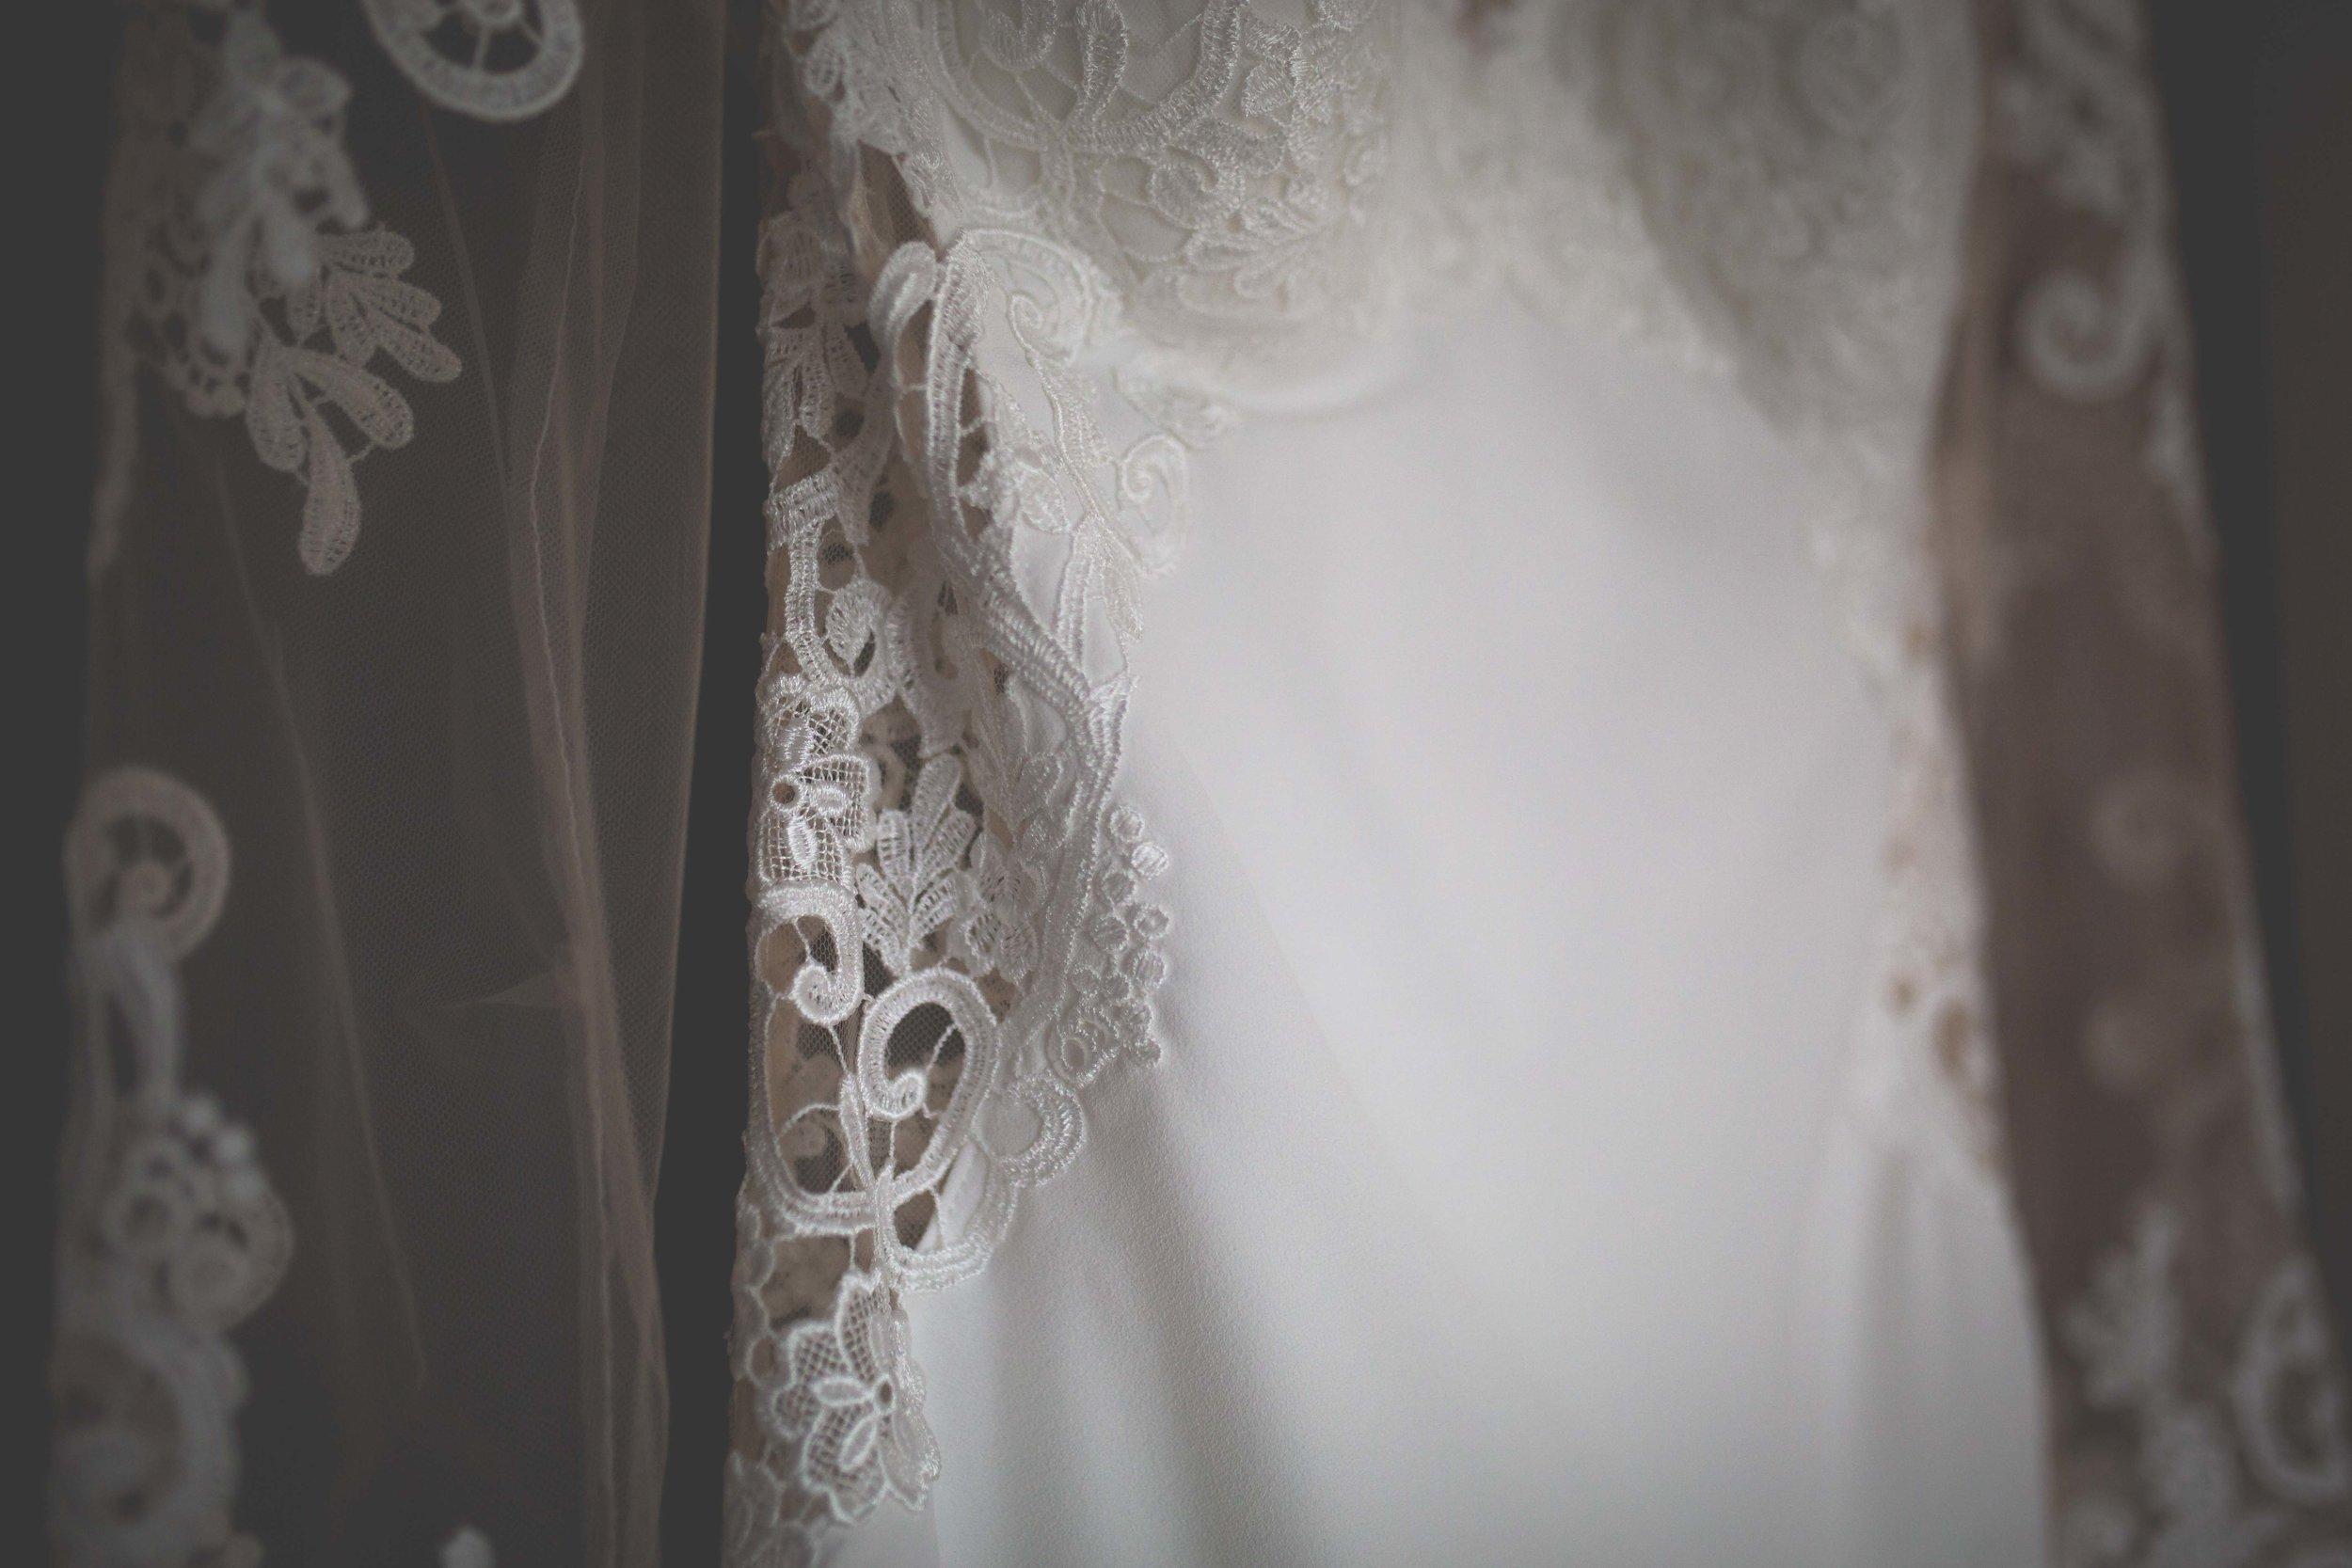 MaryJo_Conor_Mageean_Bridal_Prep-105.jpg